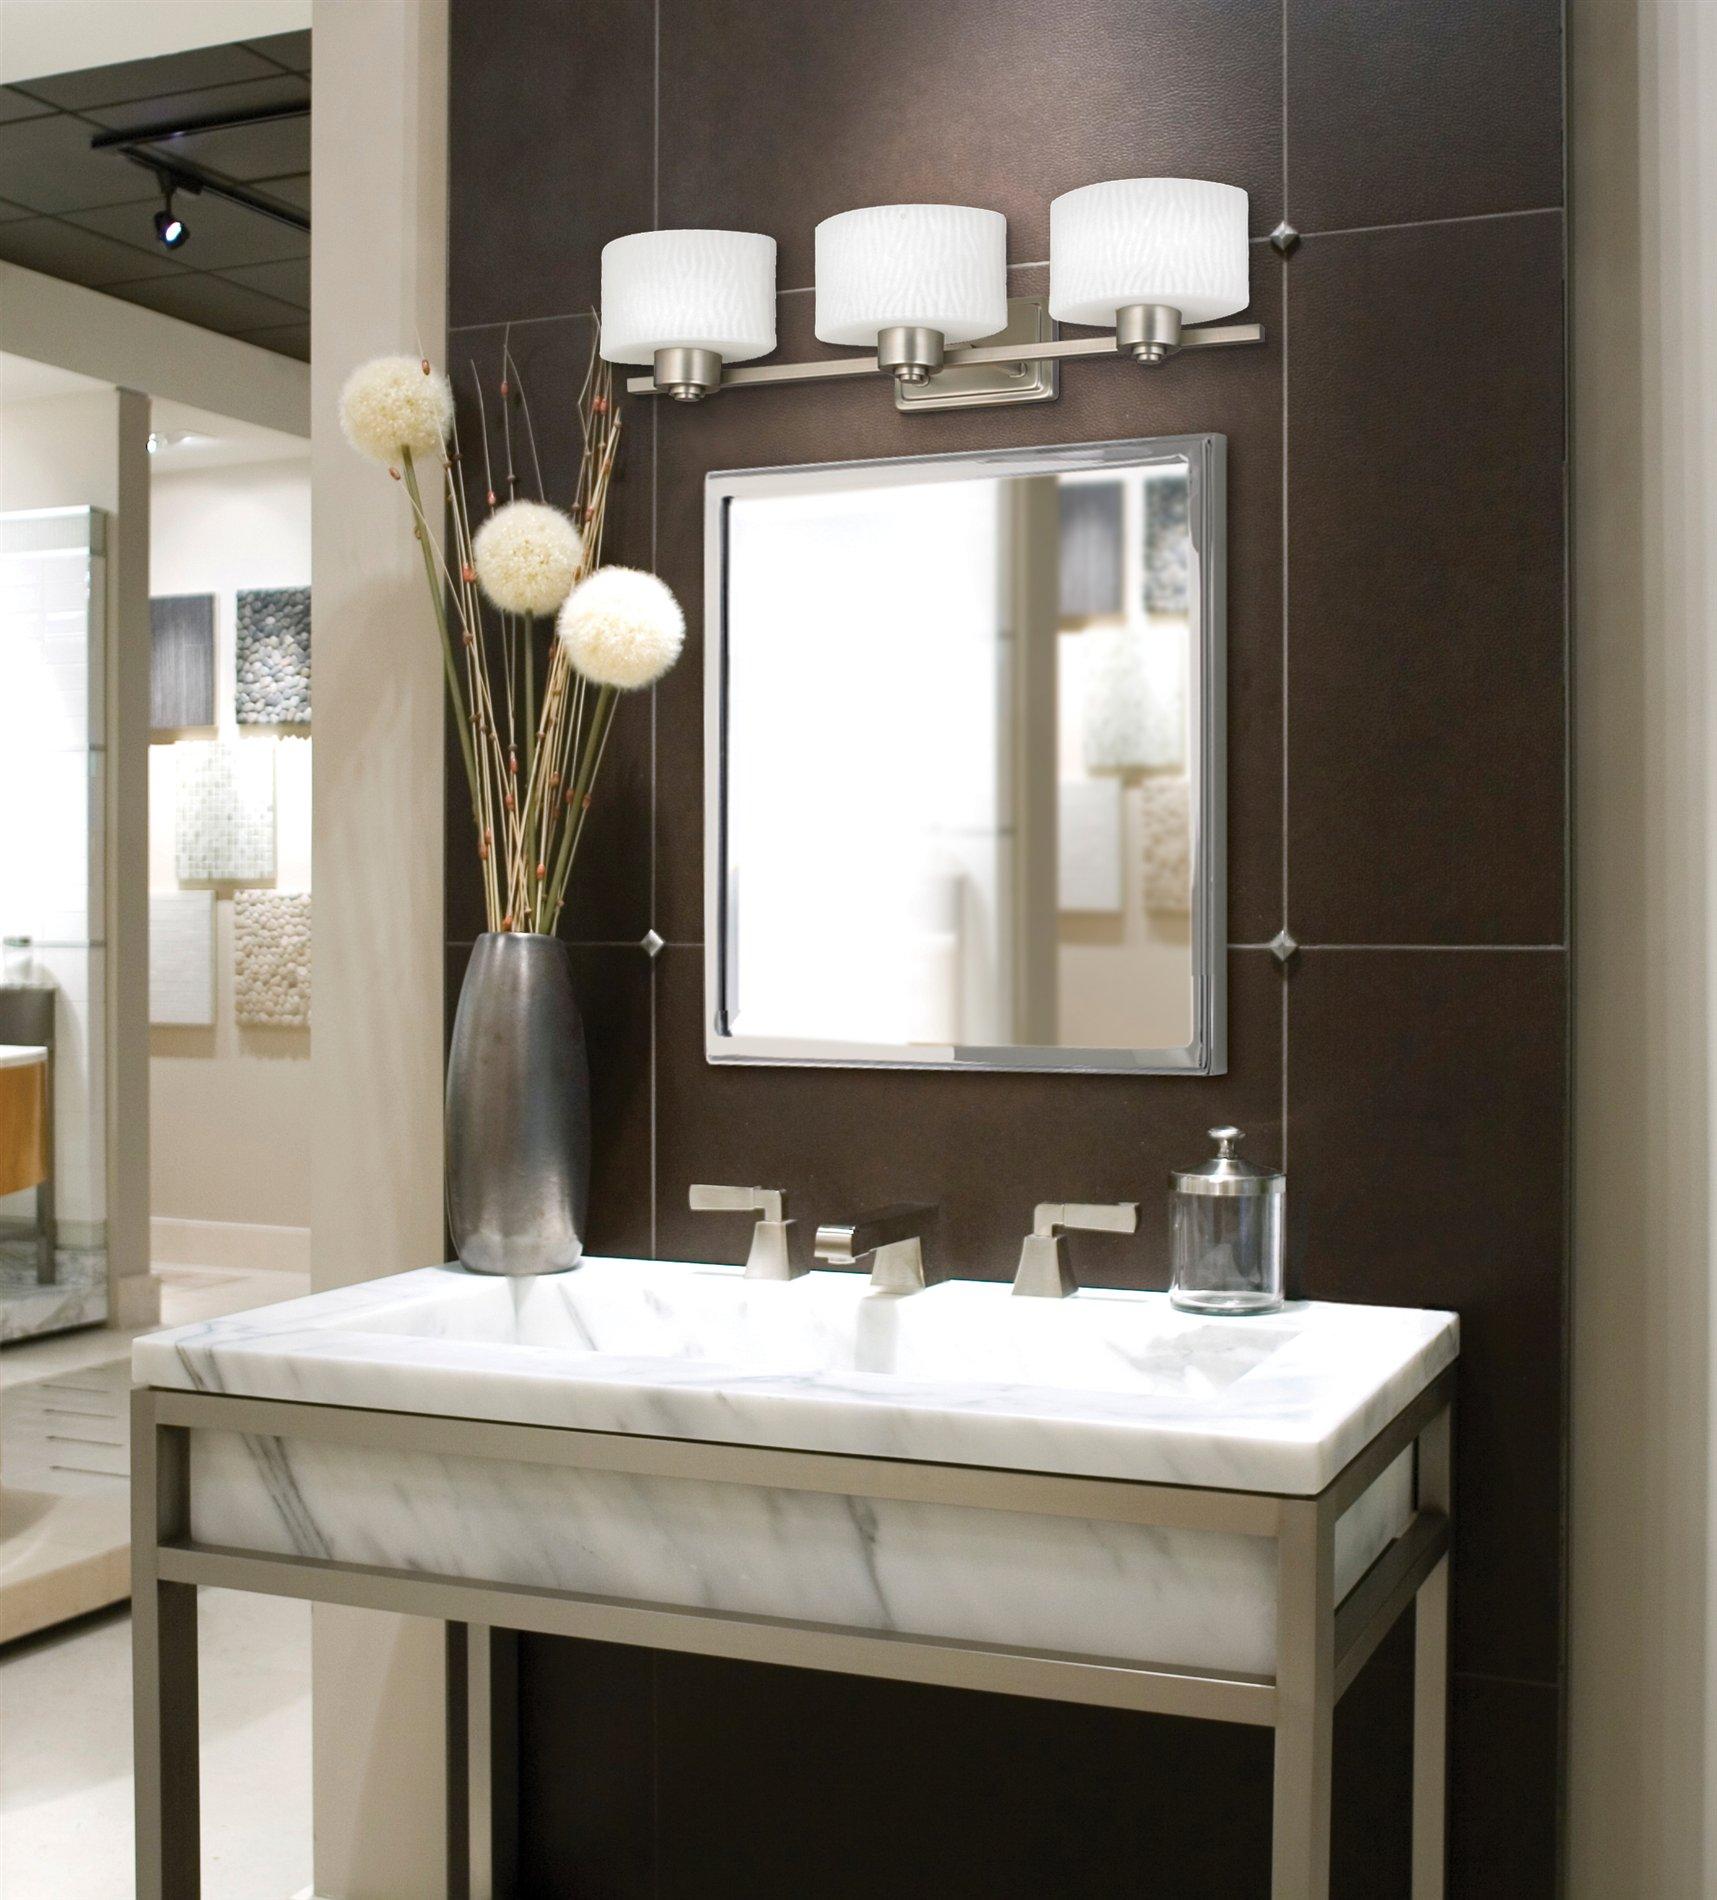 track lighting for bathroom. Brilliant Track Beautiful White Wall Mounted Track Lighting For Bathroom Sleek  Modern Decorative Flower Clean For Track Lighting Bathroom